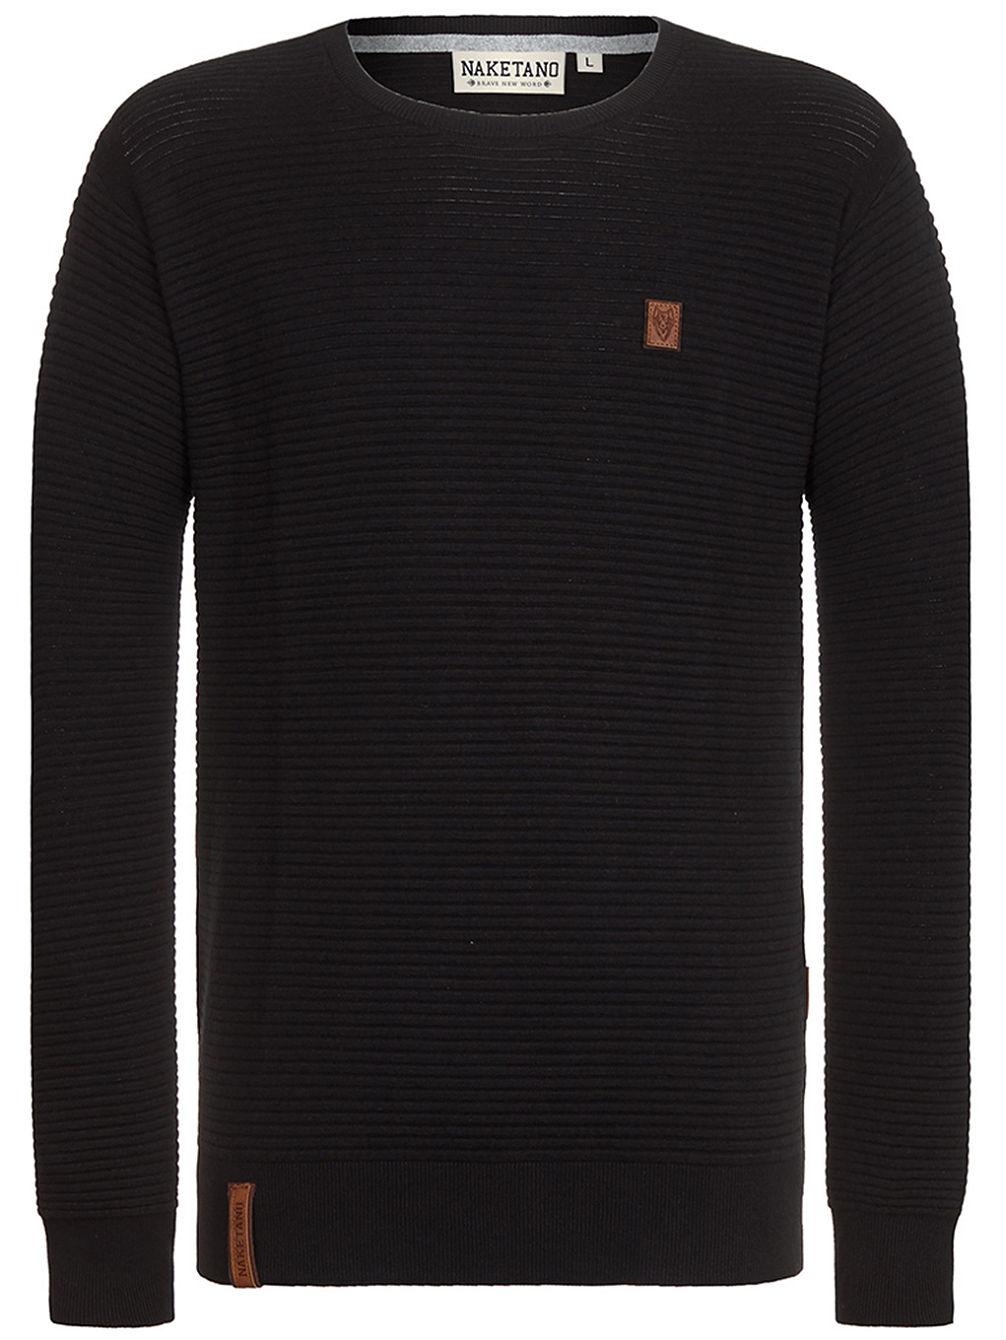 naketano-zapzarap-zip-zap-iii-pullover